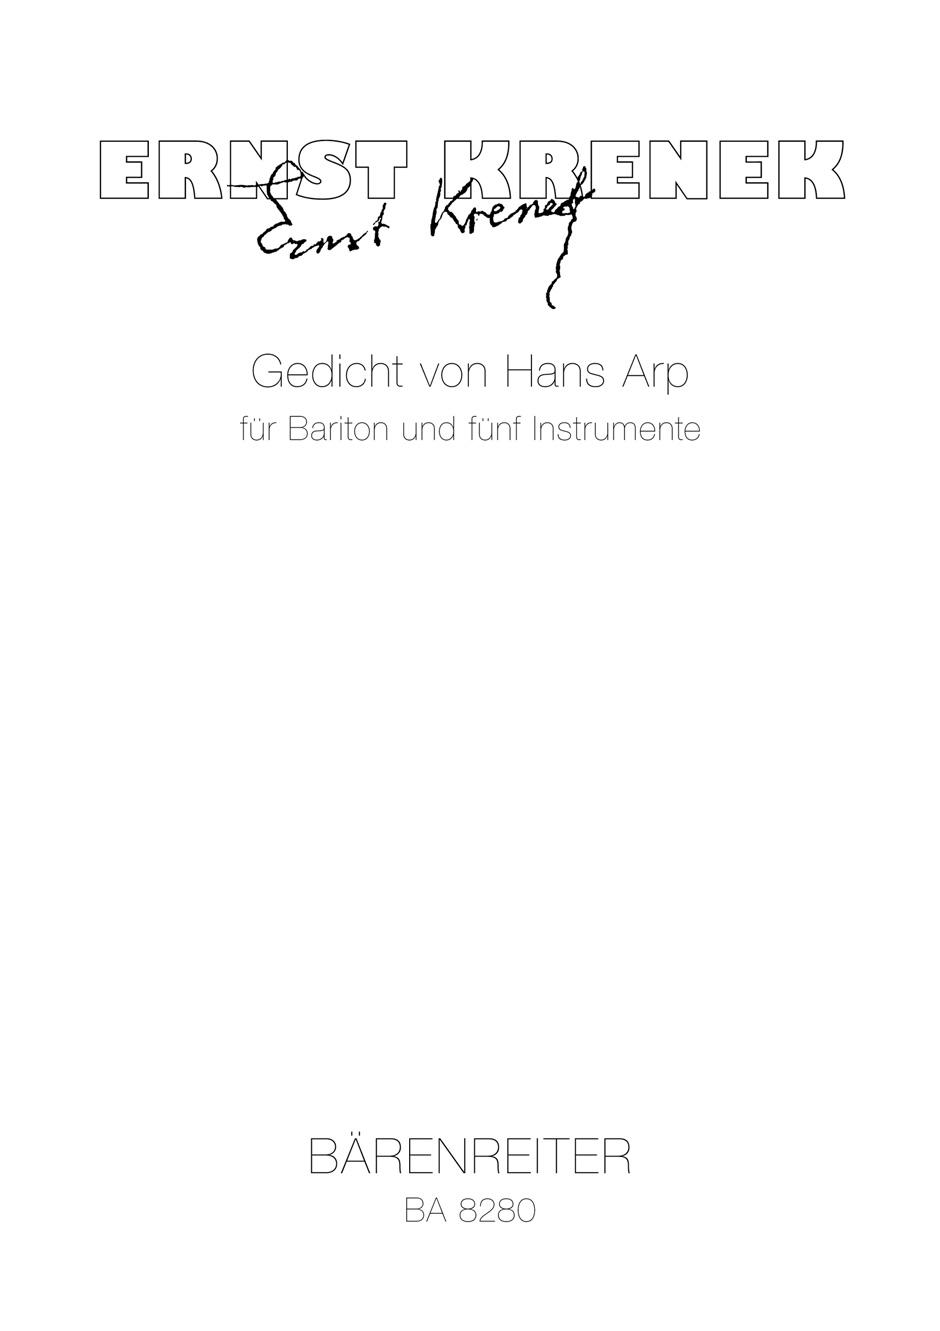 Poem by Hans Arp